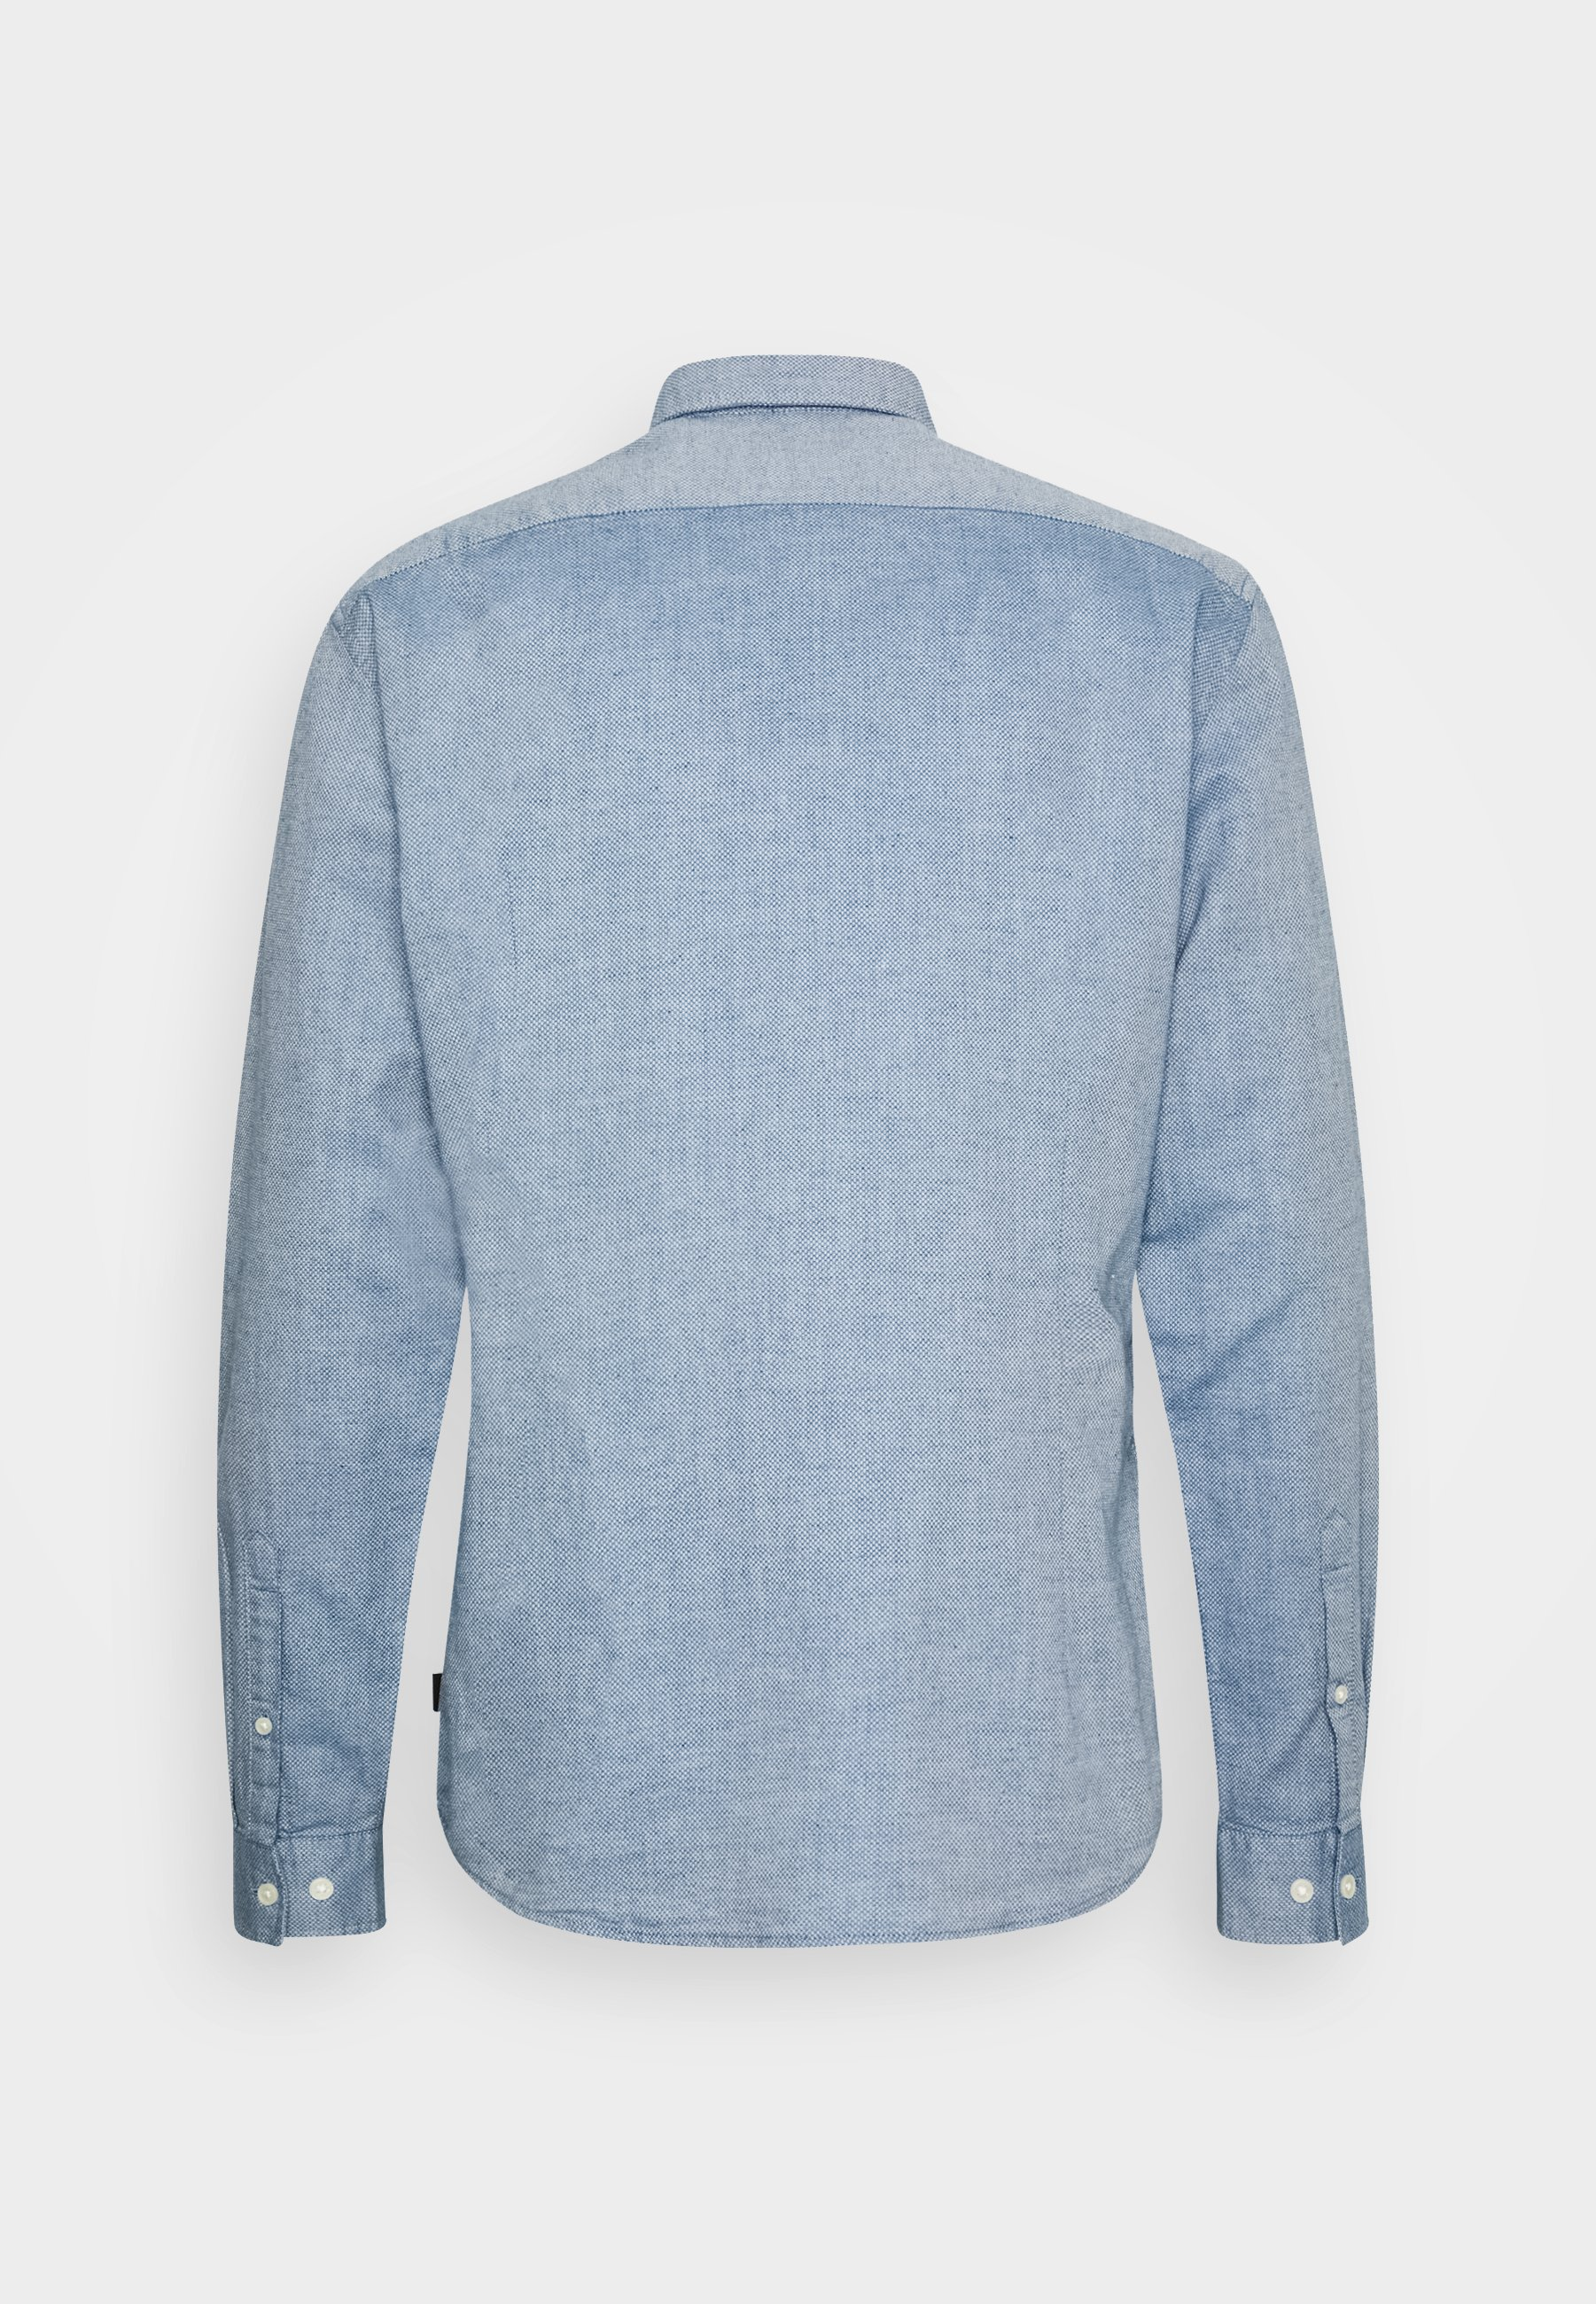 Esprit Slub Struct - Hemd Grey/blue